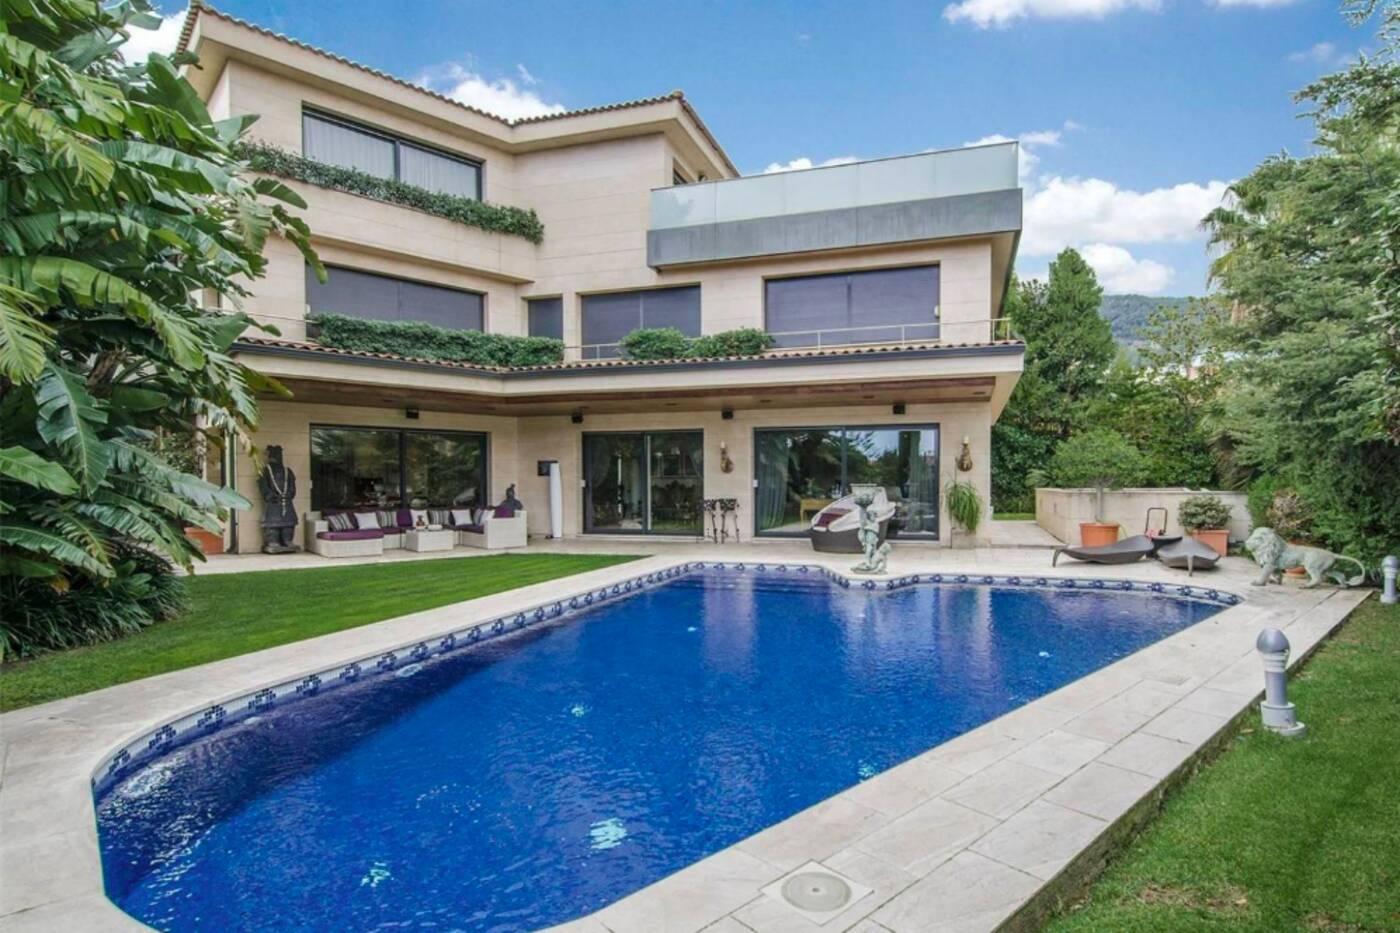 10 million house barcelona